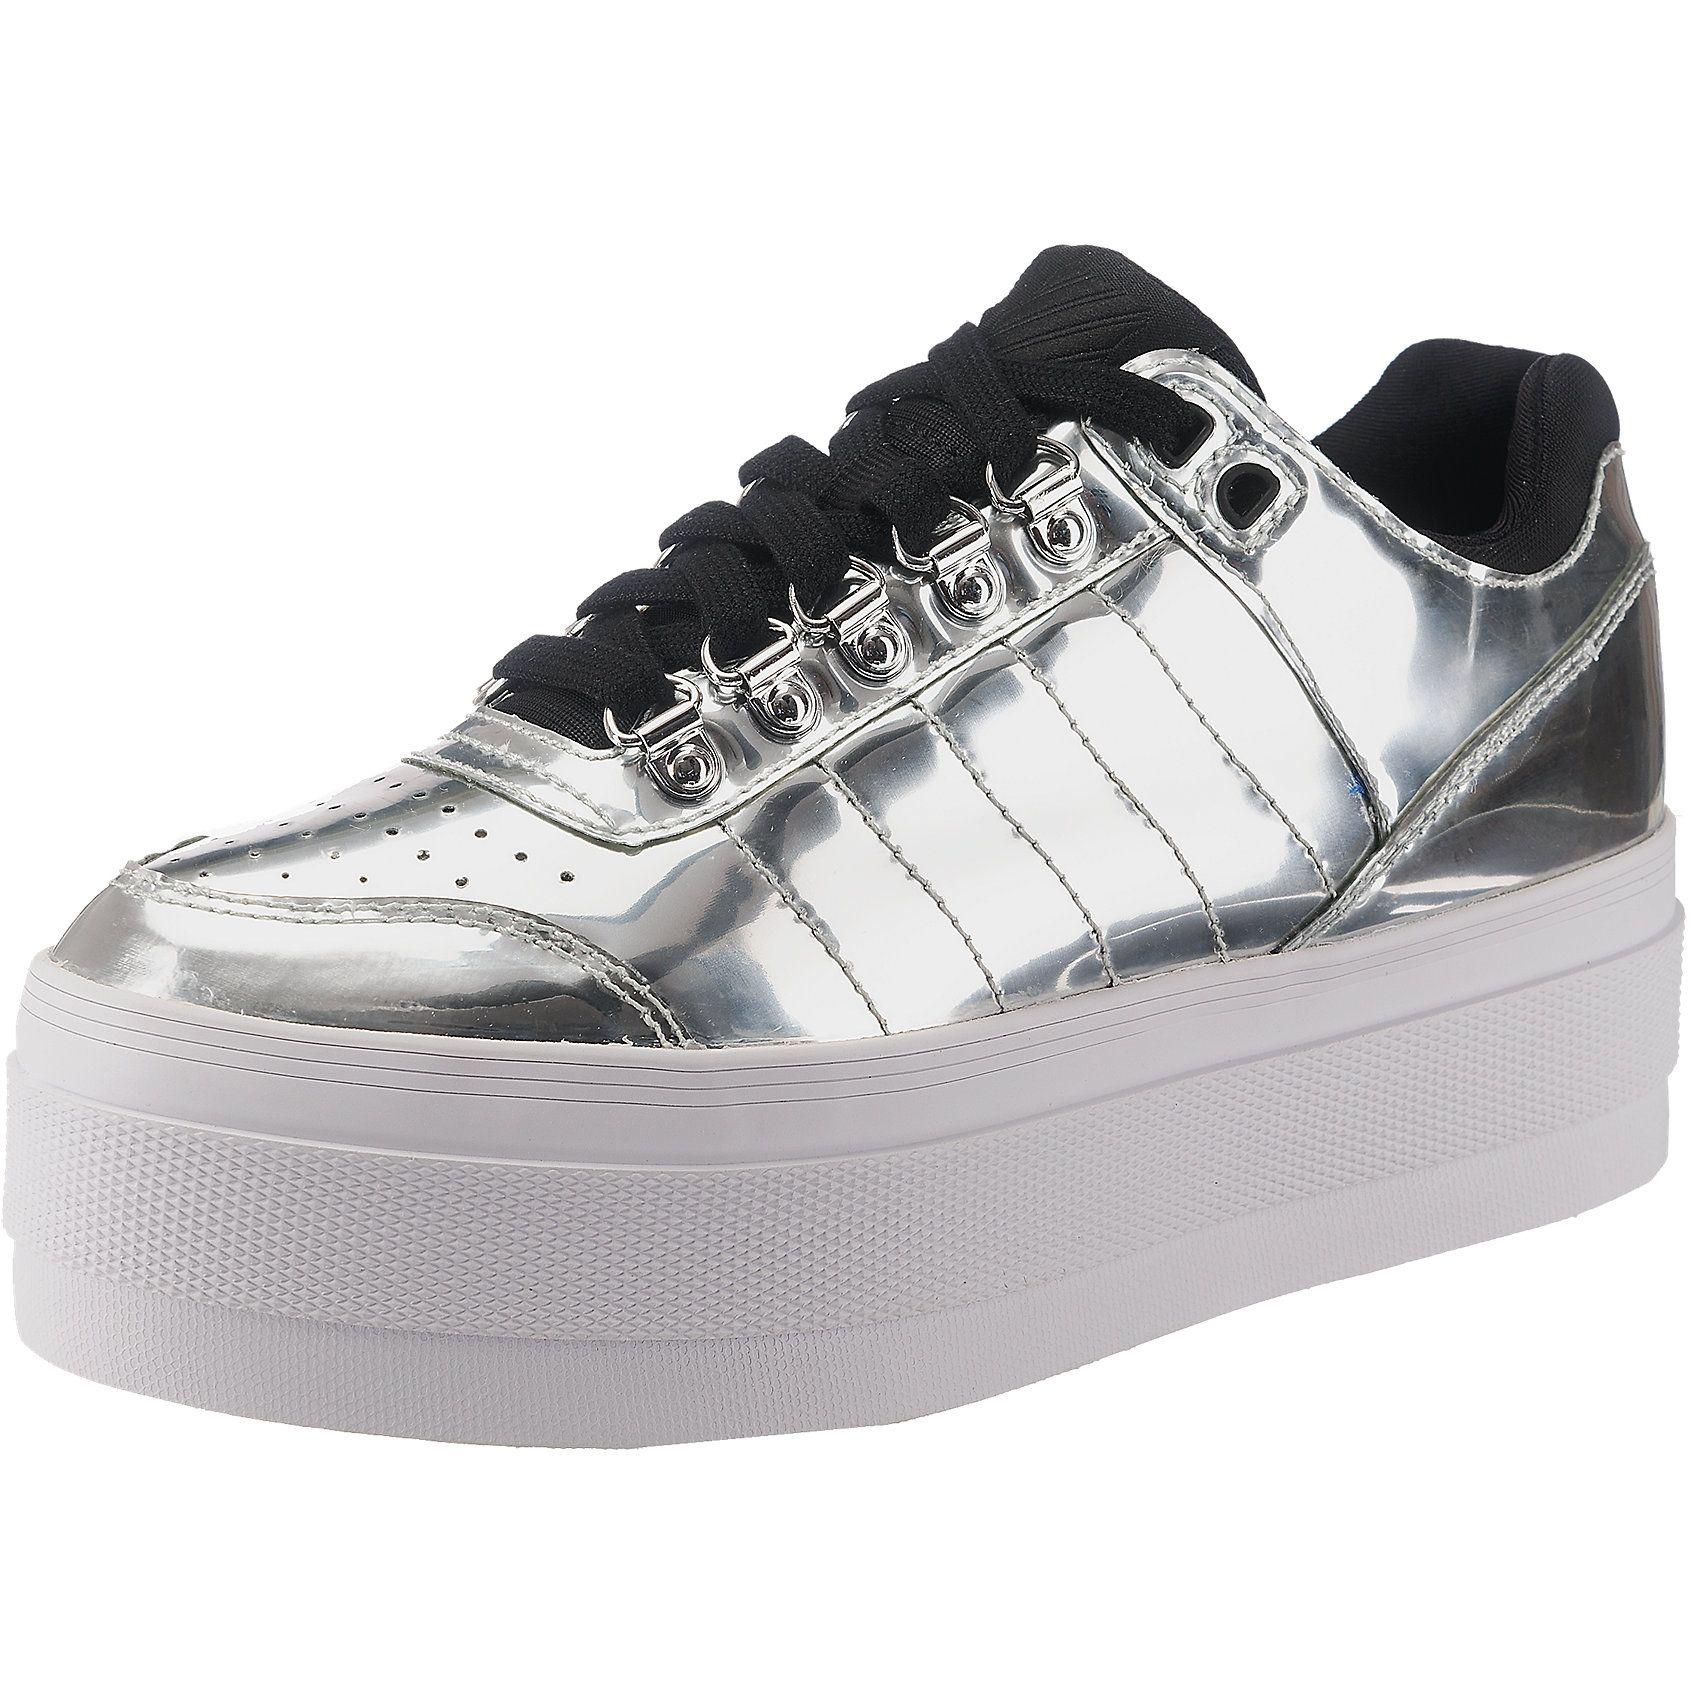 Plateau-Sneaker KING No Name   ▻Görtz◁ Ausdrucksstark   Pinterest   Shoes  style and Fashion